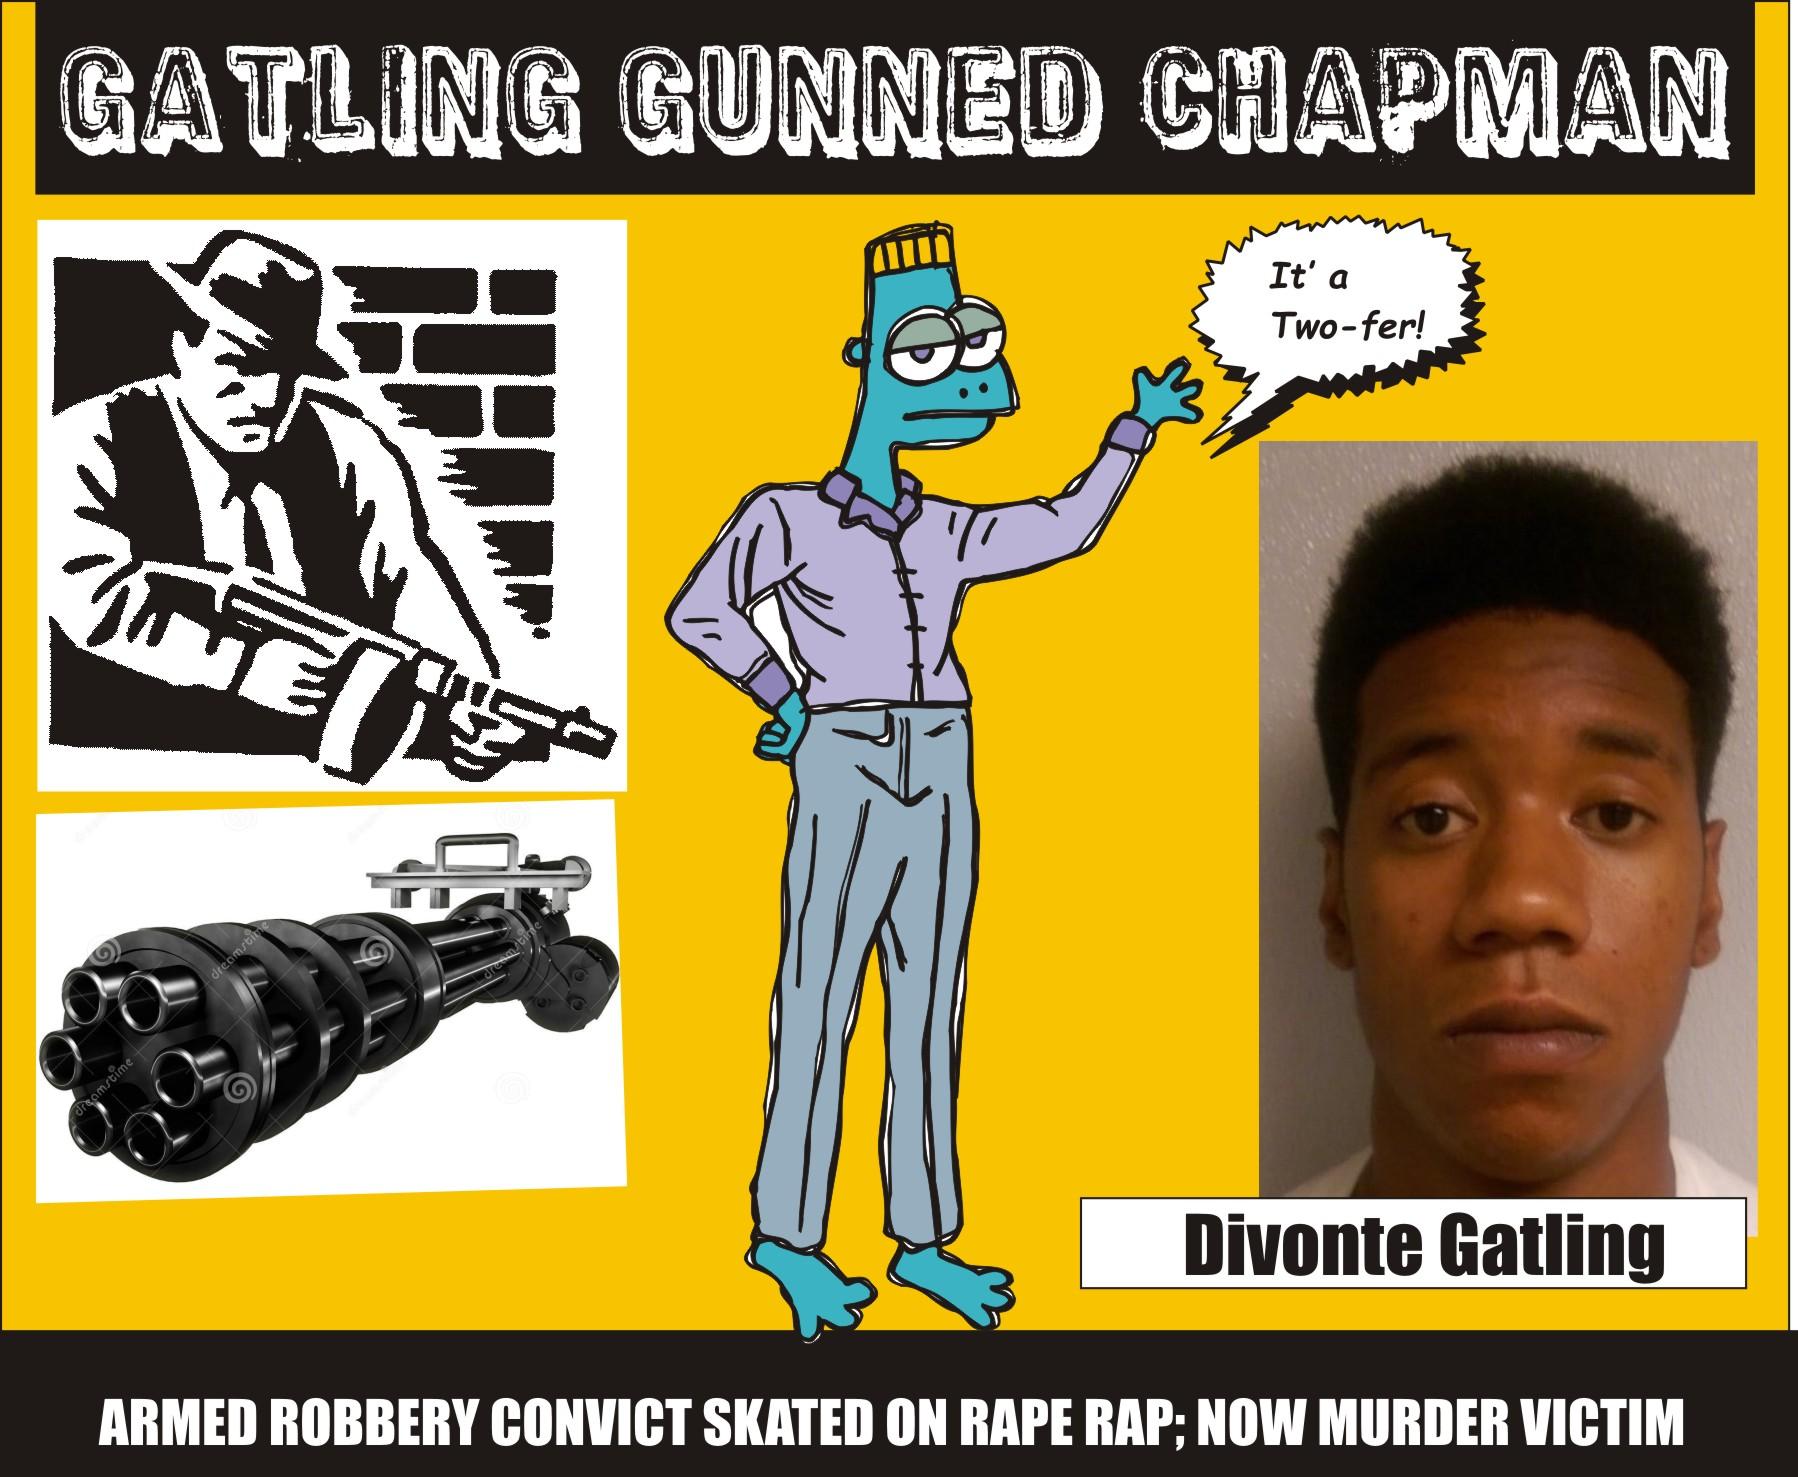 Gatling gunned Chapman pgpd 072716